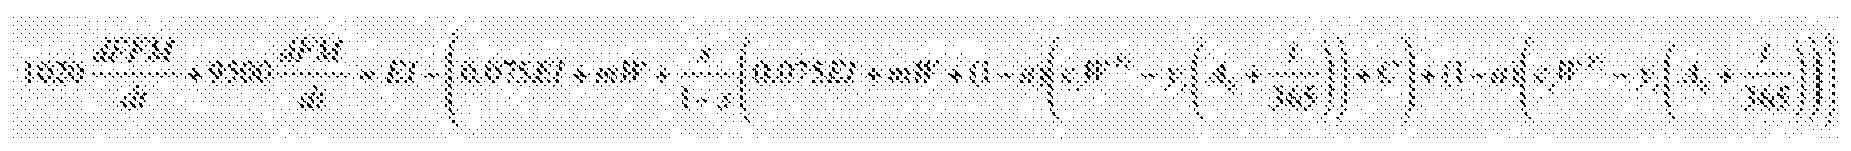 Figure CN105765593AD00121